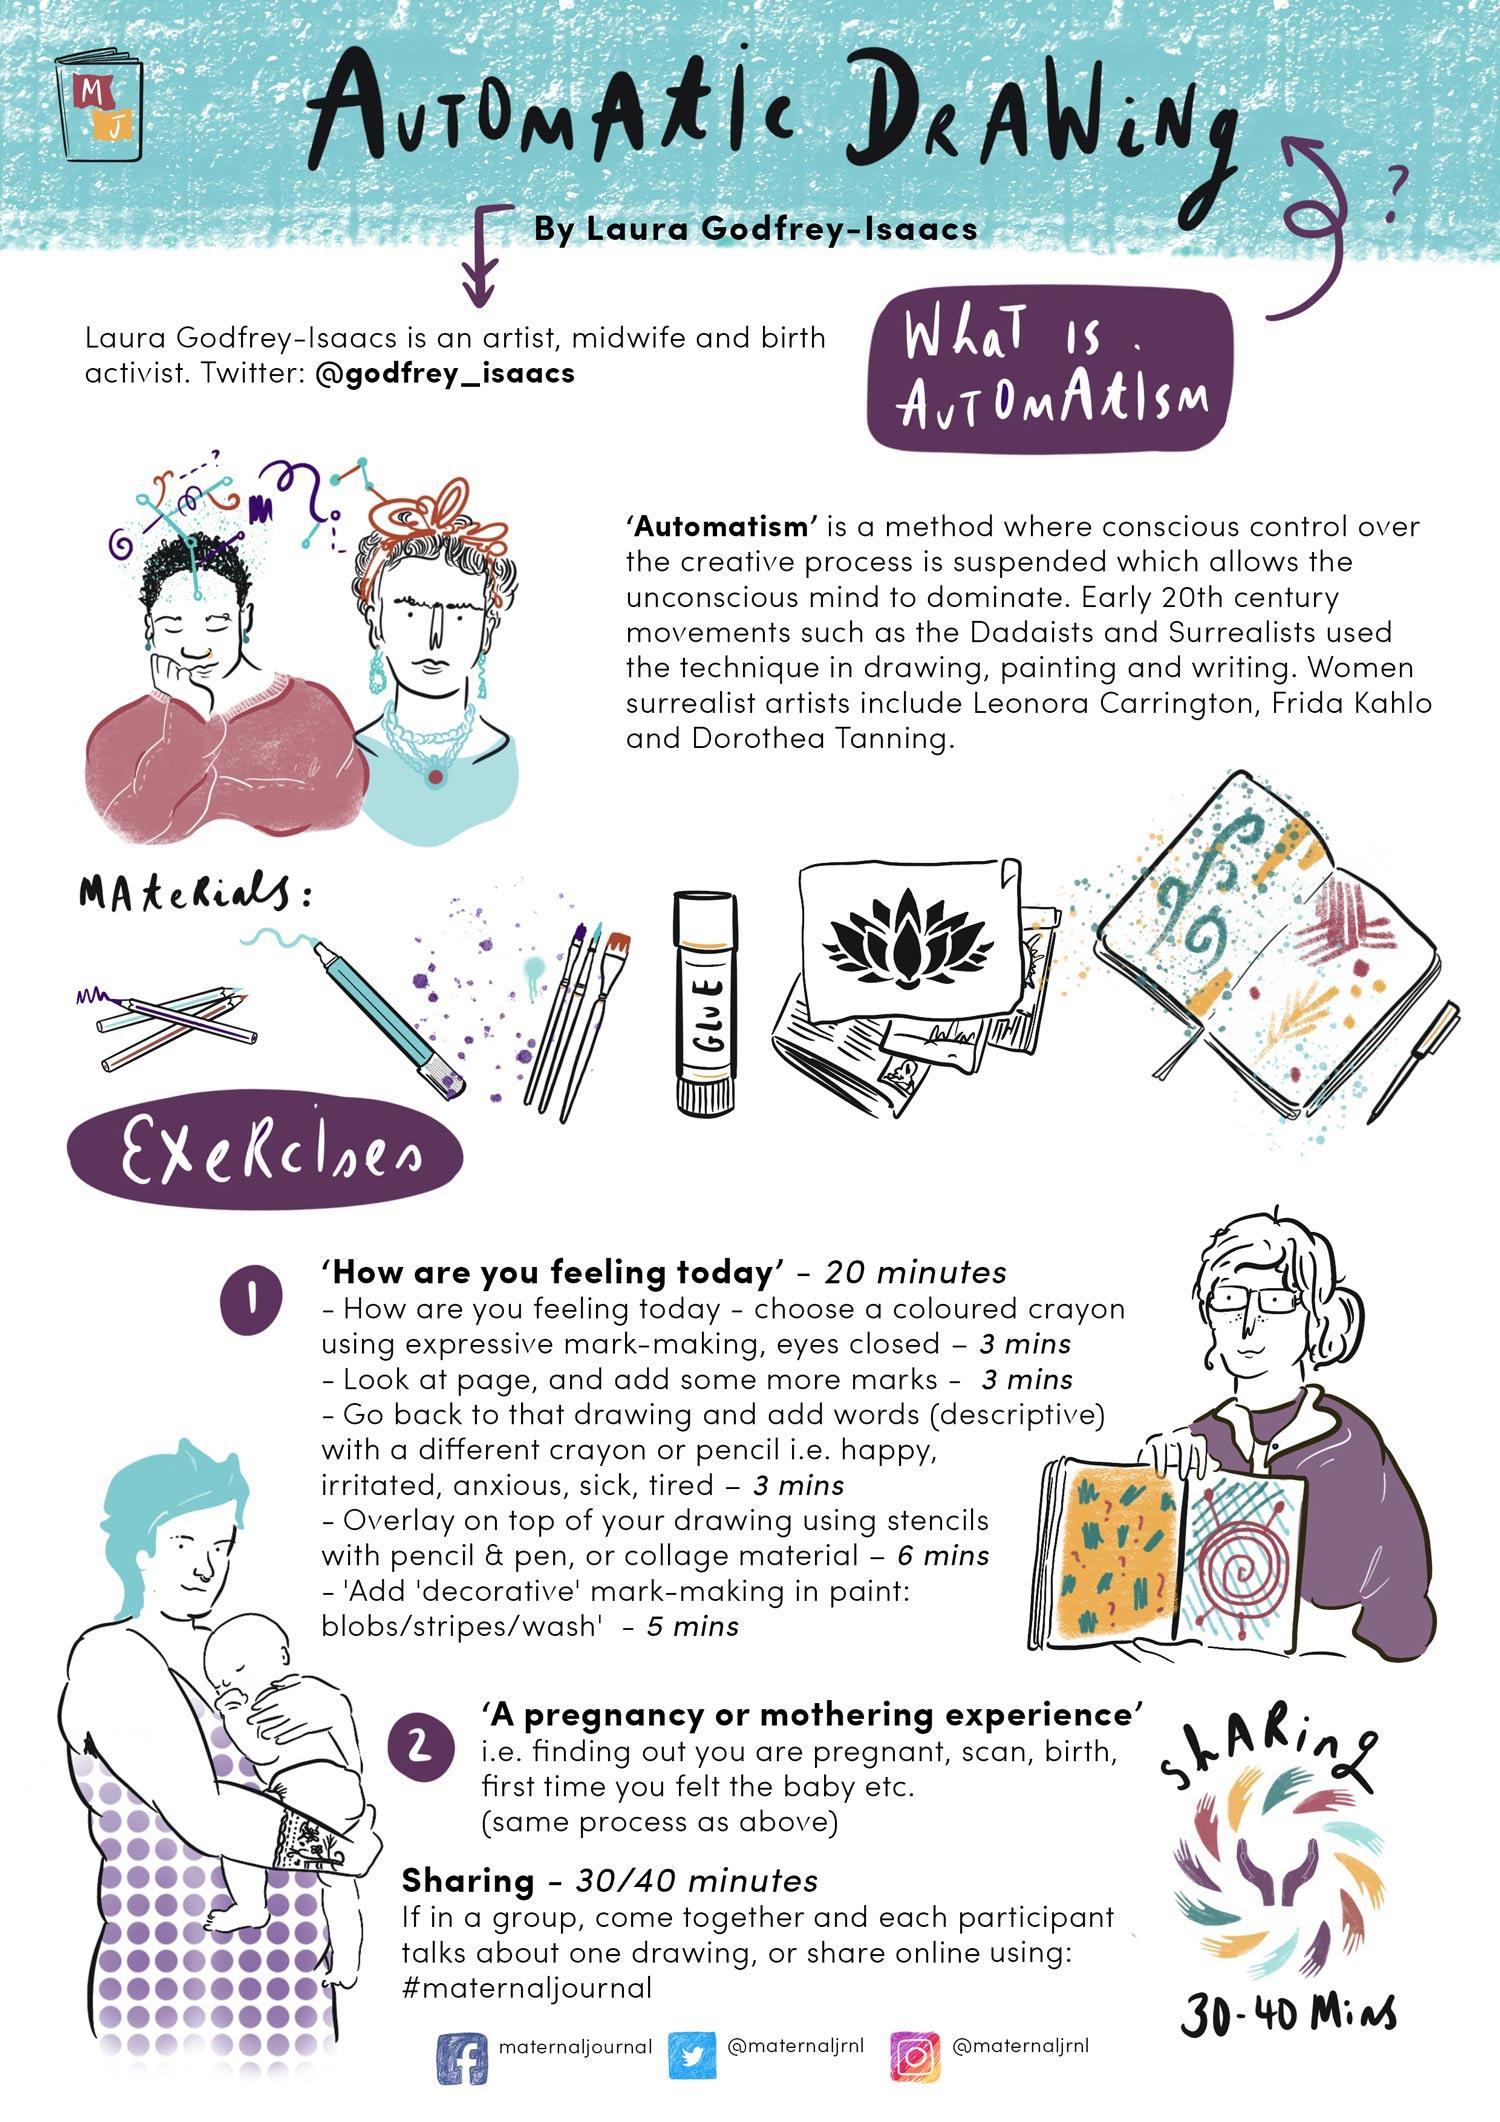 Automatic Drawing | Laura Godfrey-Isaacs| Illustration by Merlin Strangeway | Maternal Journal 2019